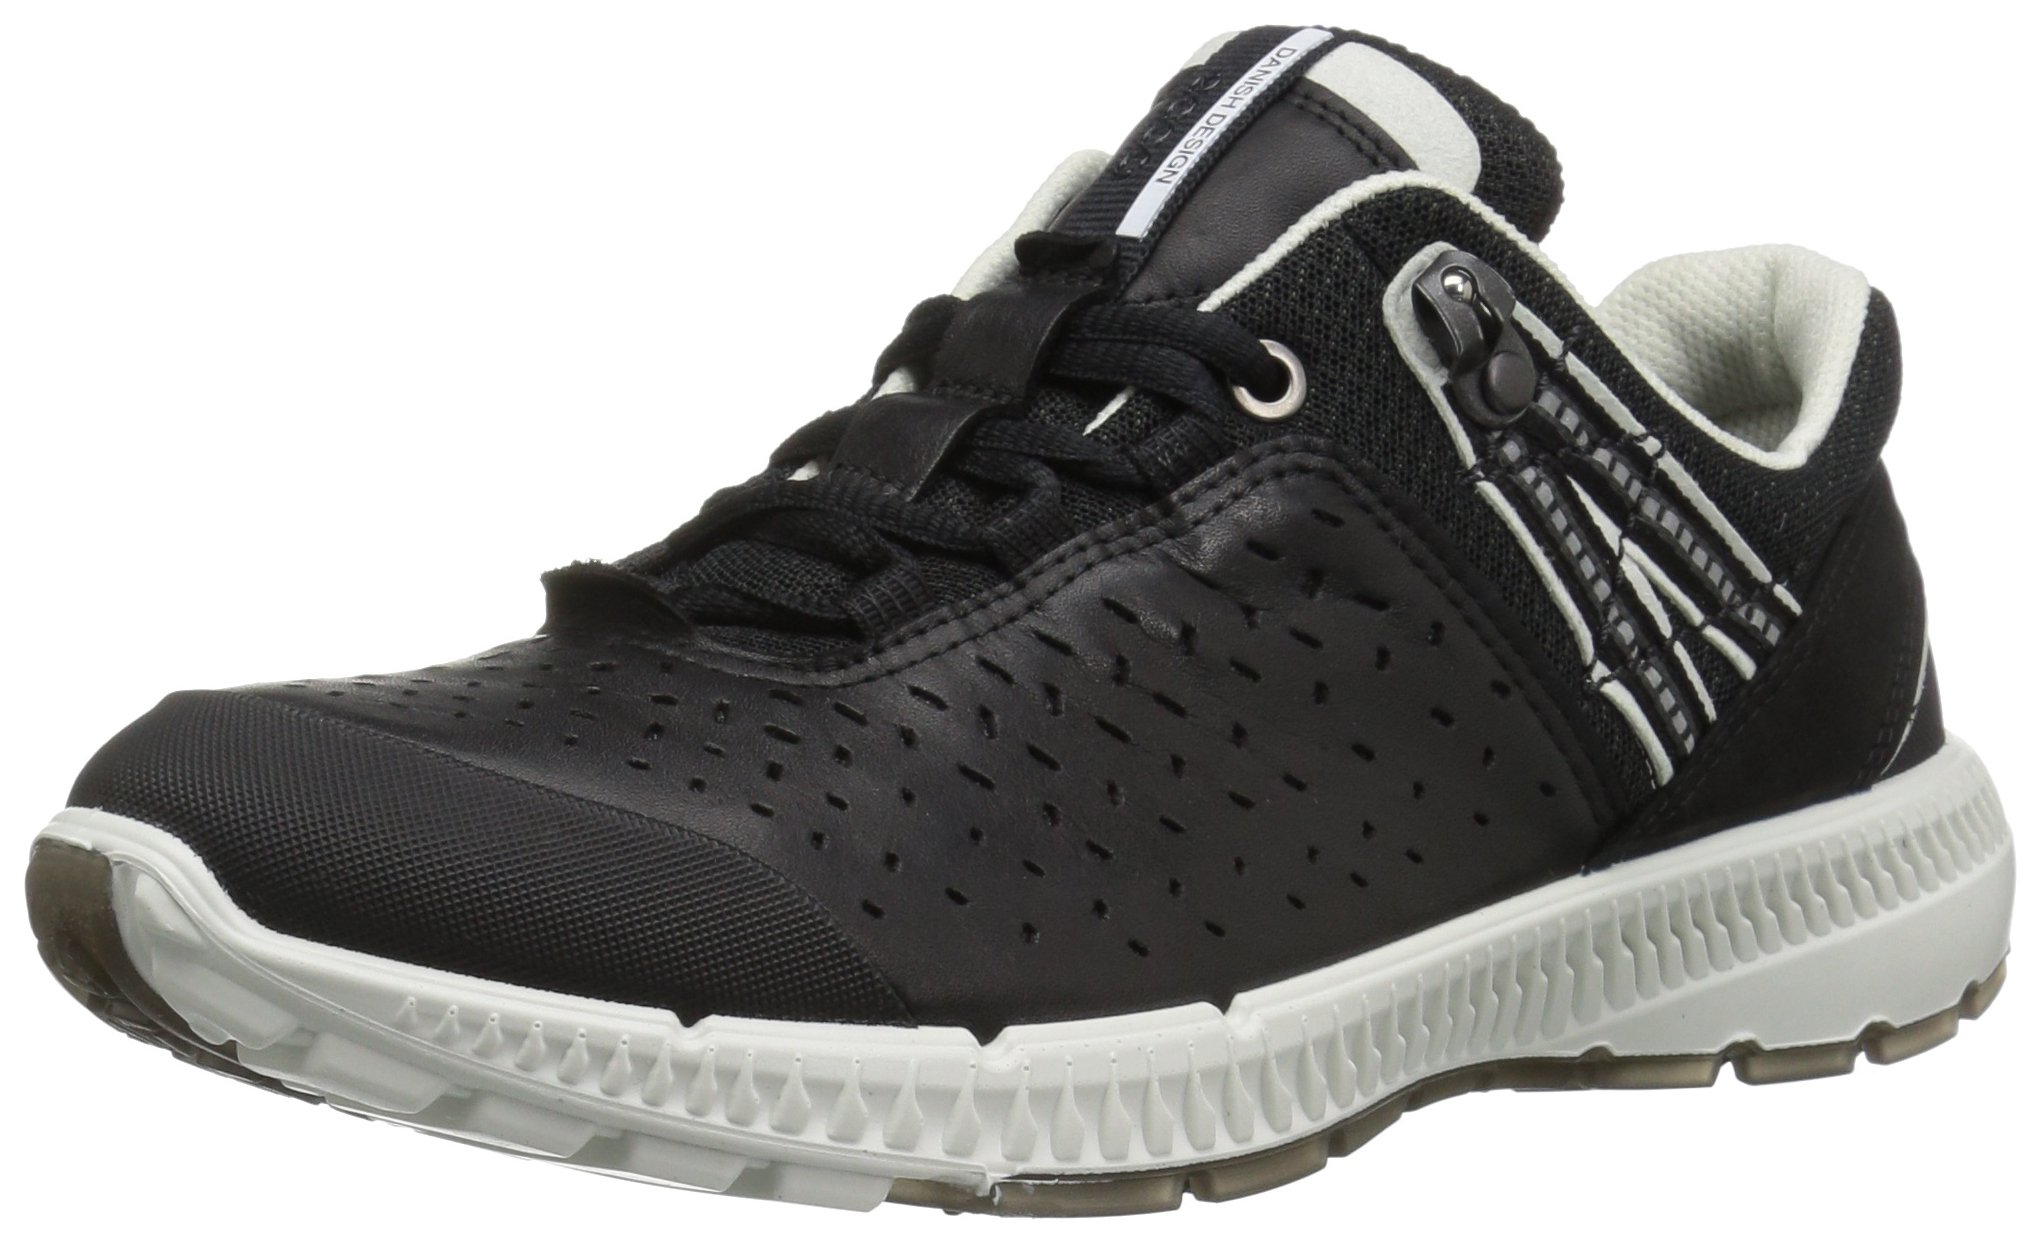 TrSneakers Black40 FemmeNoir Basses Ecco Intrinsic Eu CrQdxBoeW